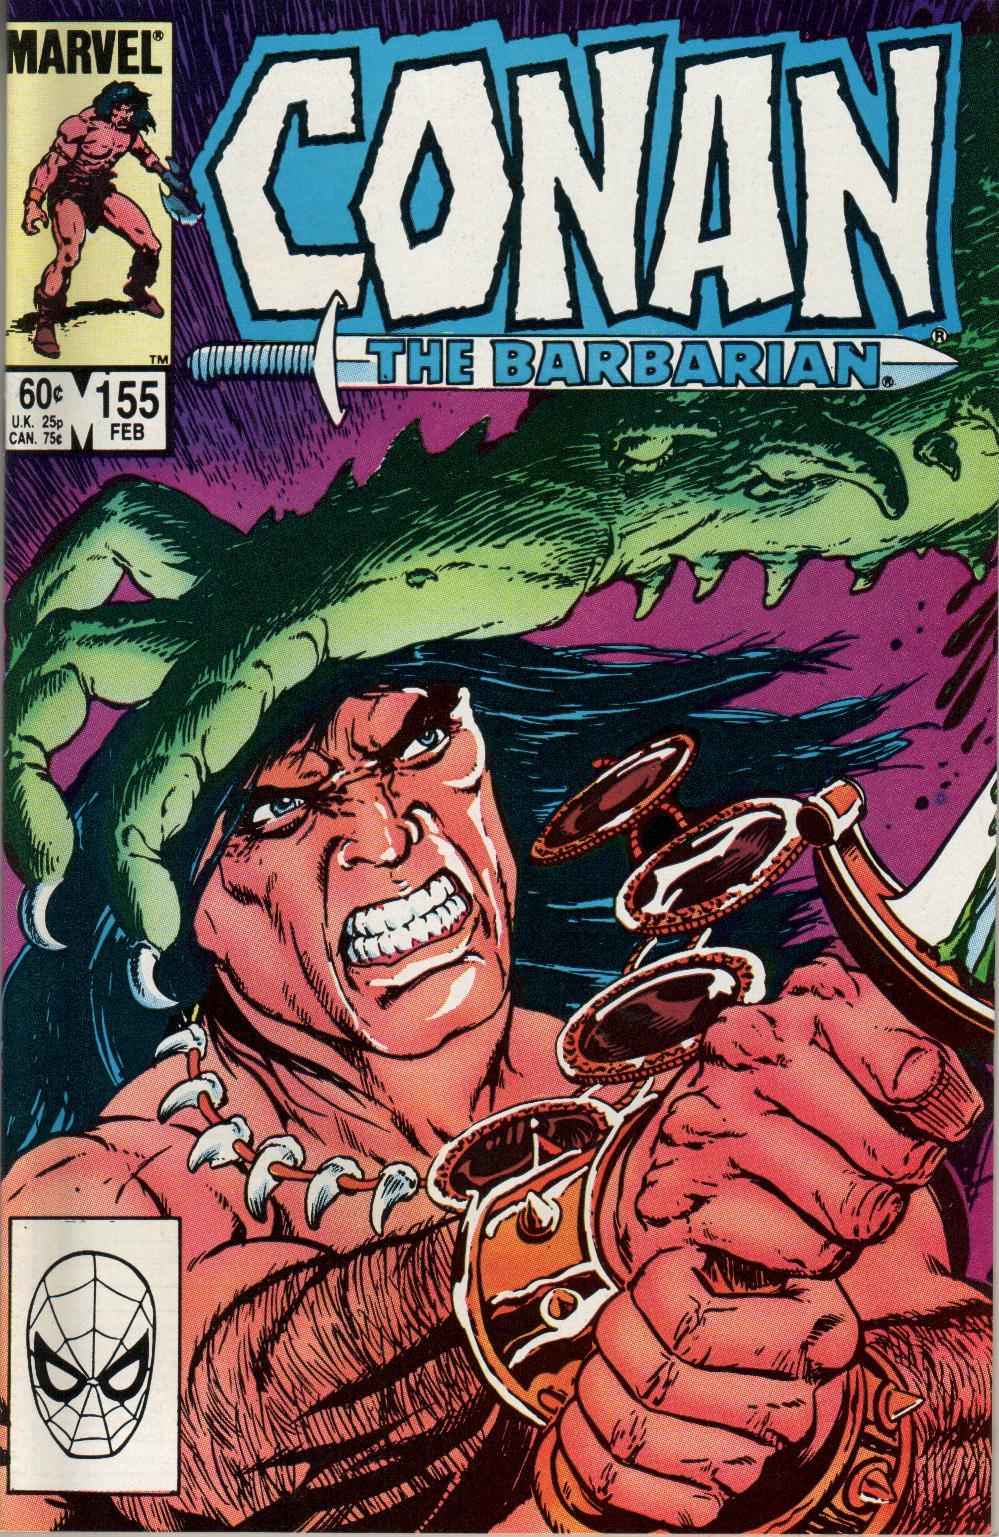 Conan the Barbarian 155